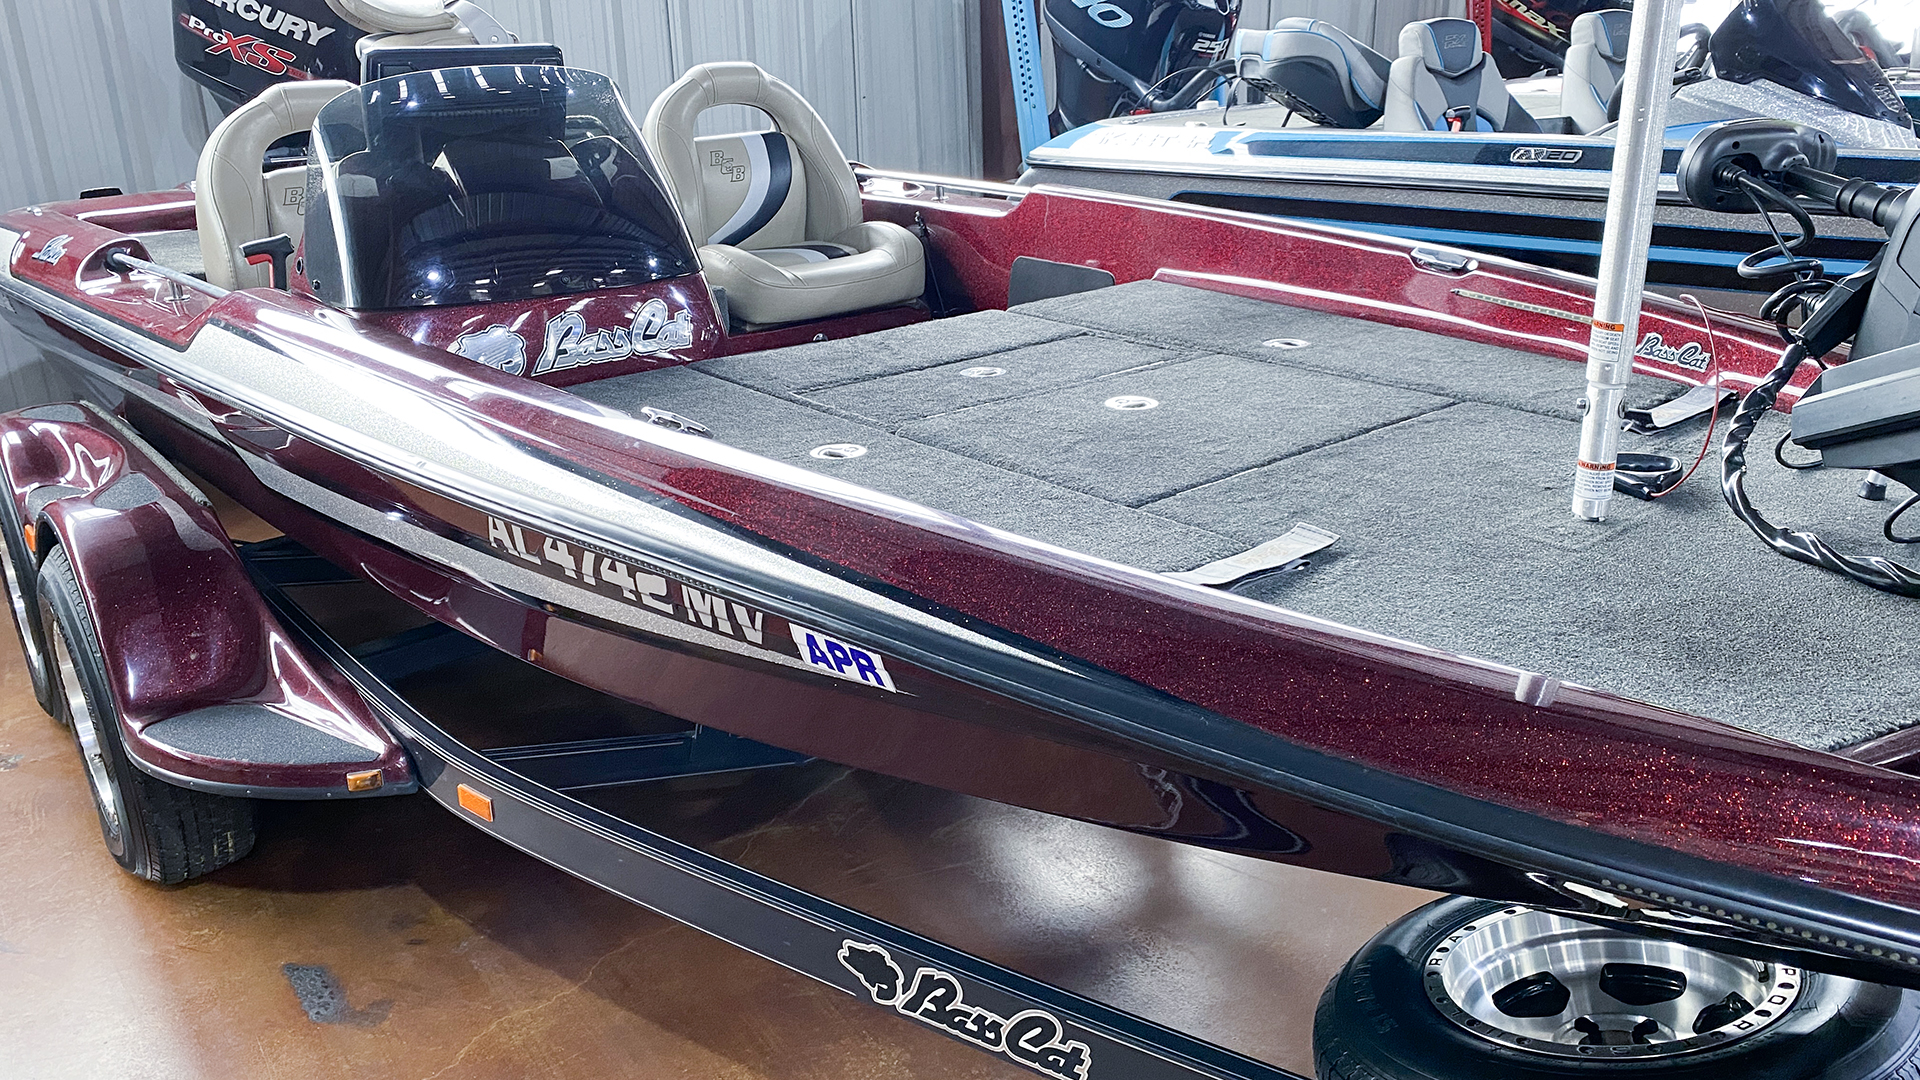 2015 Bass Cat Boats Sabre FTD Advantage Elite thumbnail